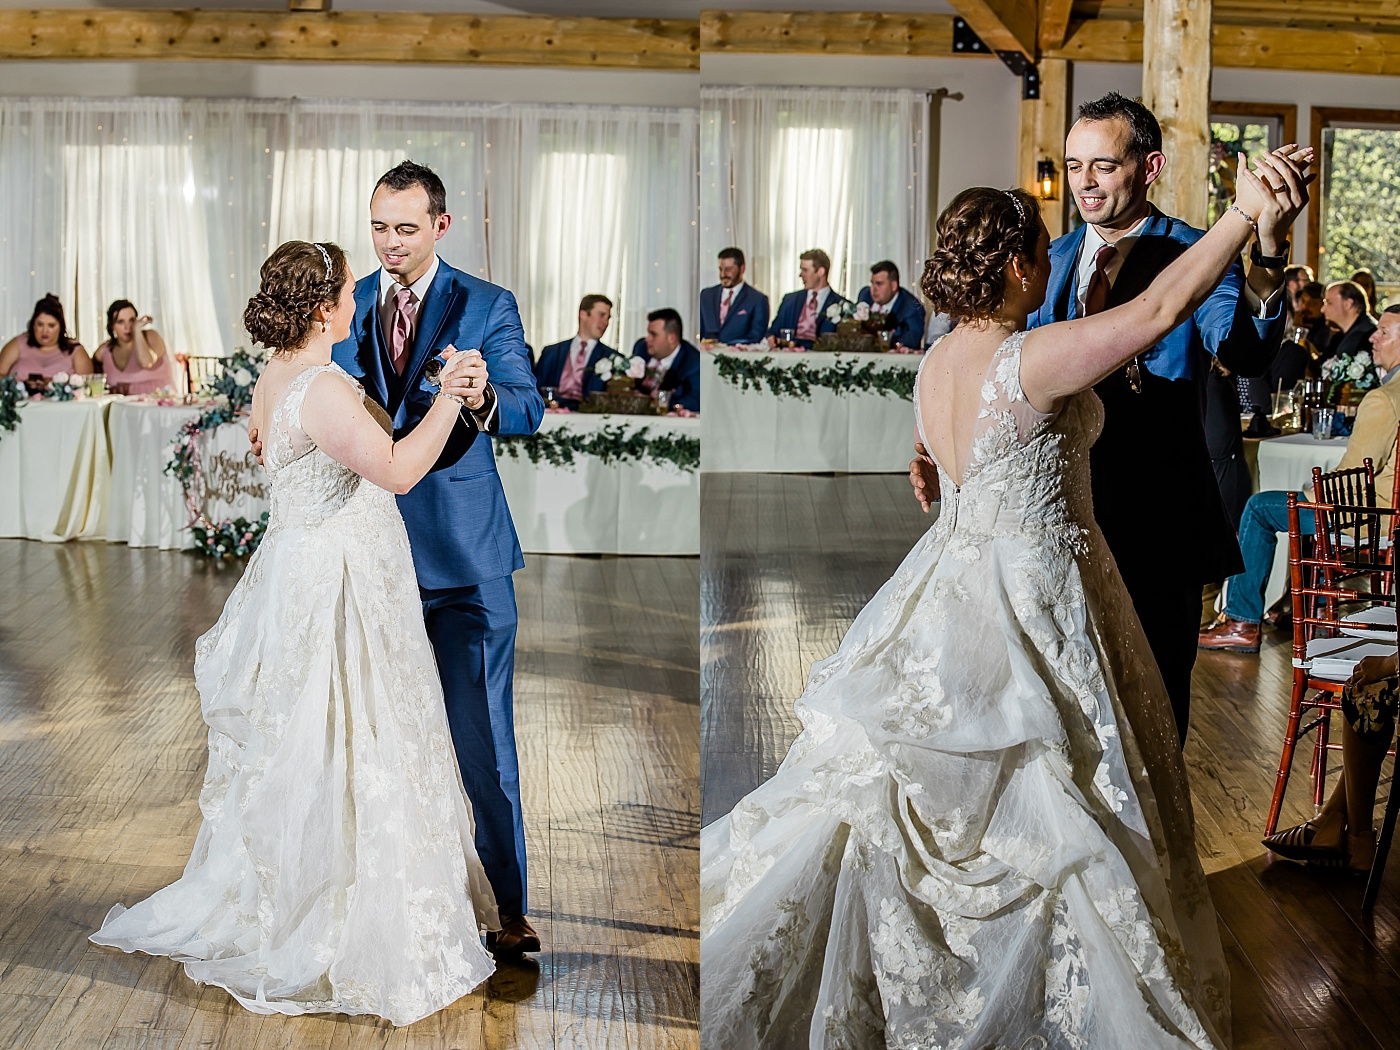 crawfordsville indiana stone creek lodge wedding rustic elegant friends theme_0231.jpg